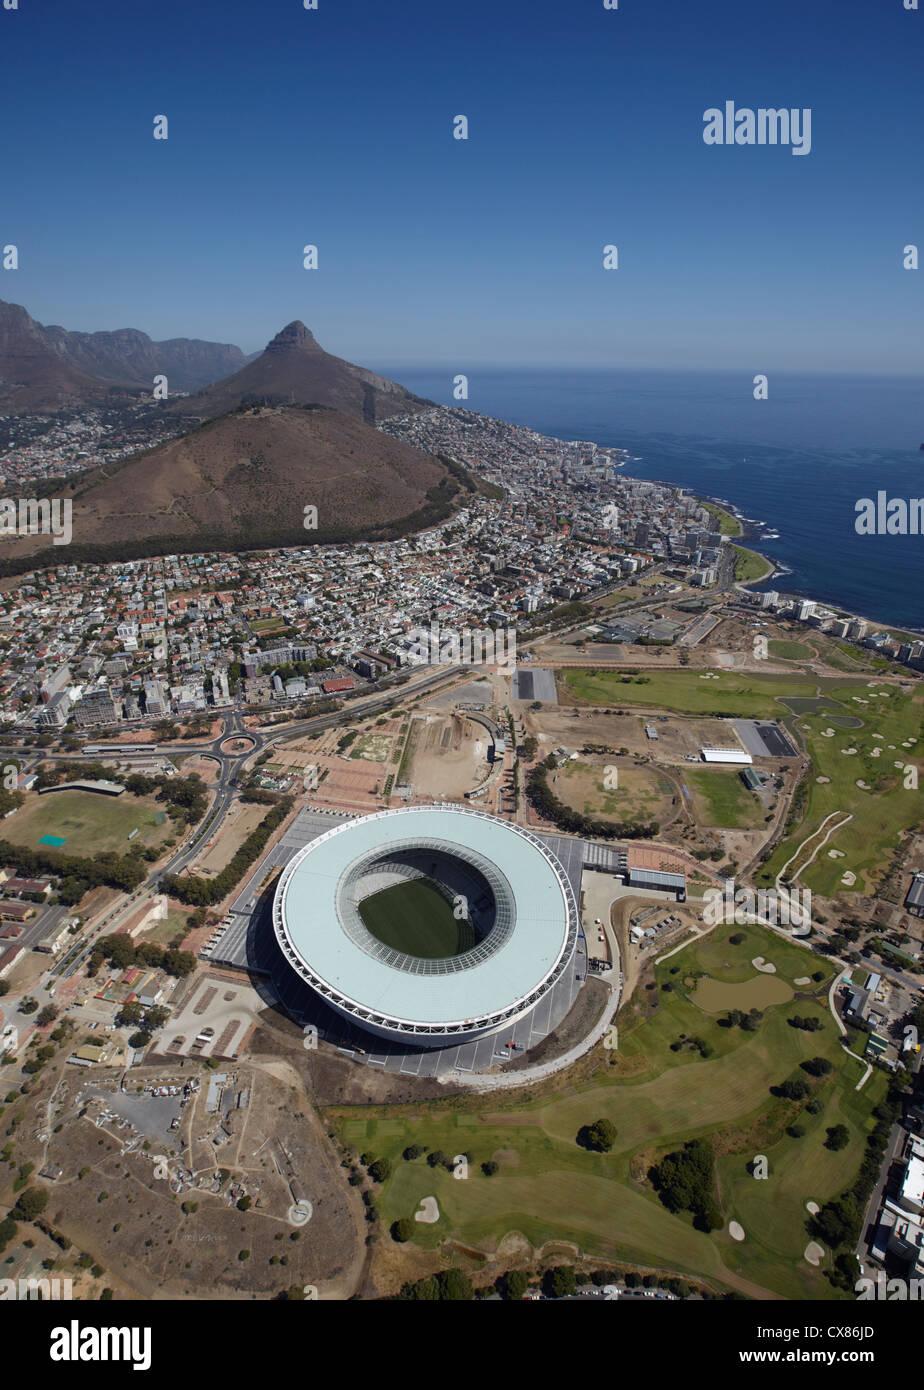 Greenpoint Stadium Aerial - Stock Image